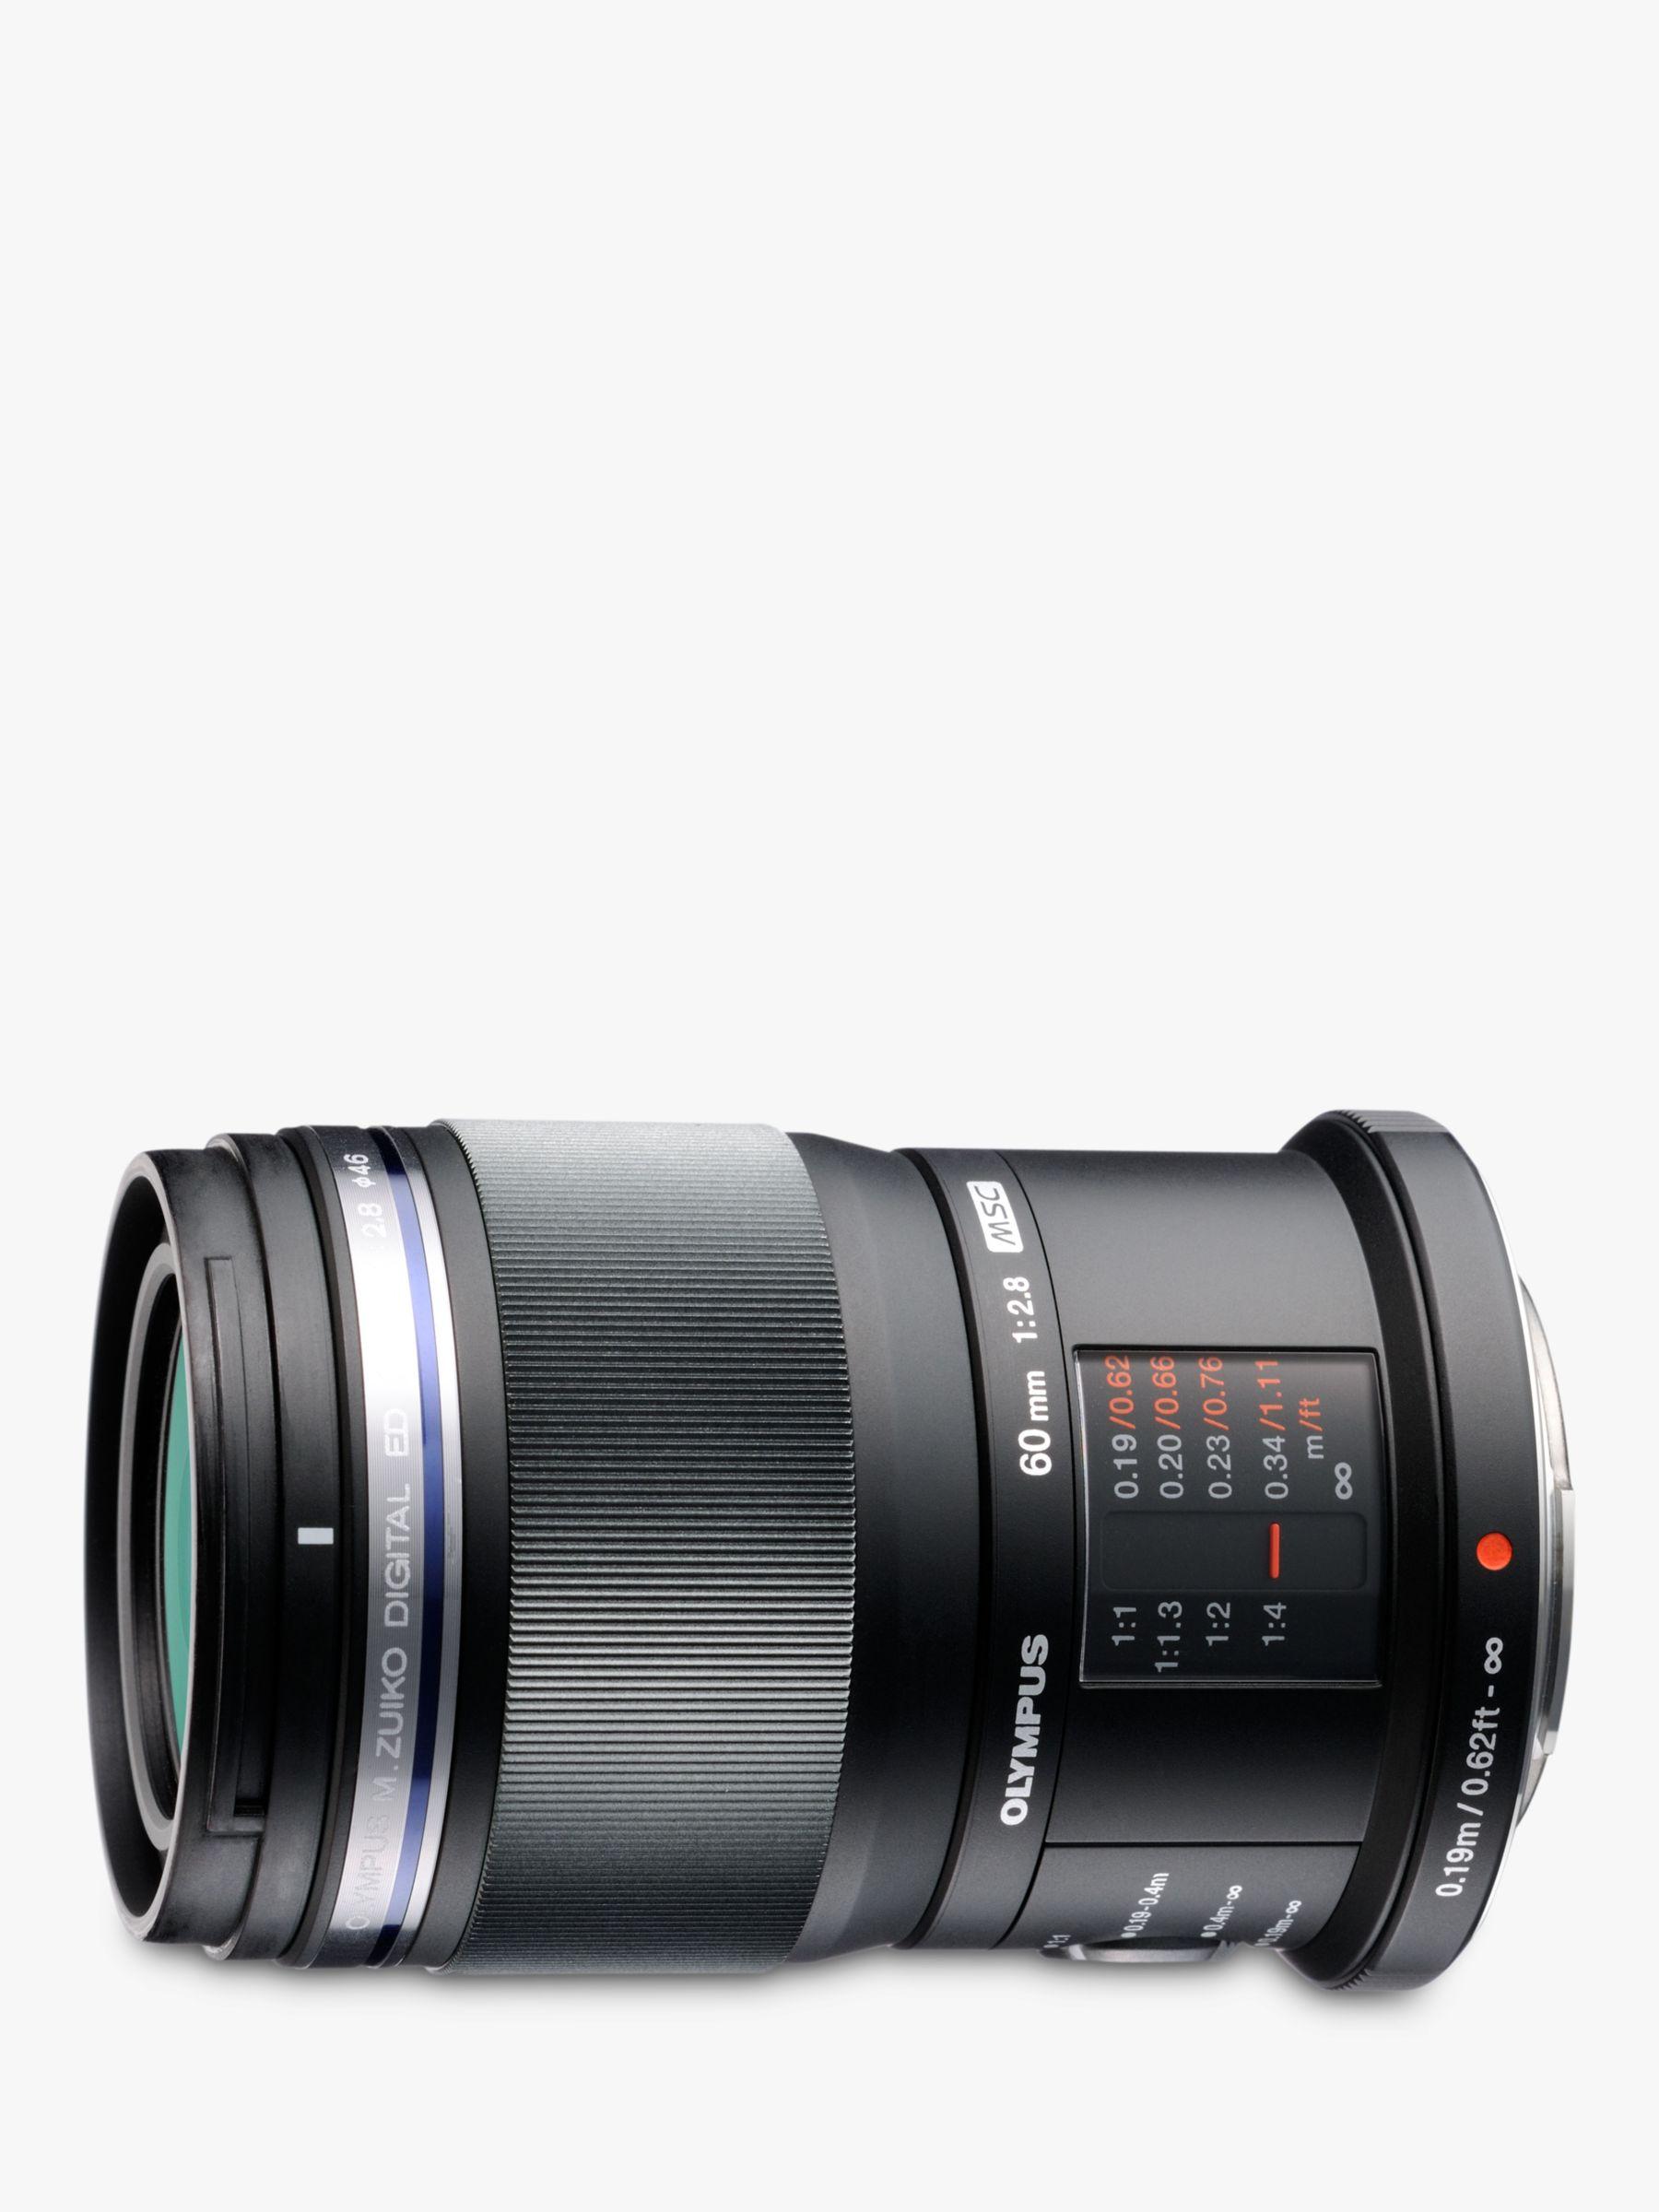 Olympus Olympus M.ZUIKO DIGITAL 60mm f/2.8 ED Macro Lens